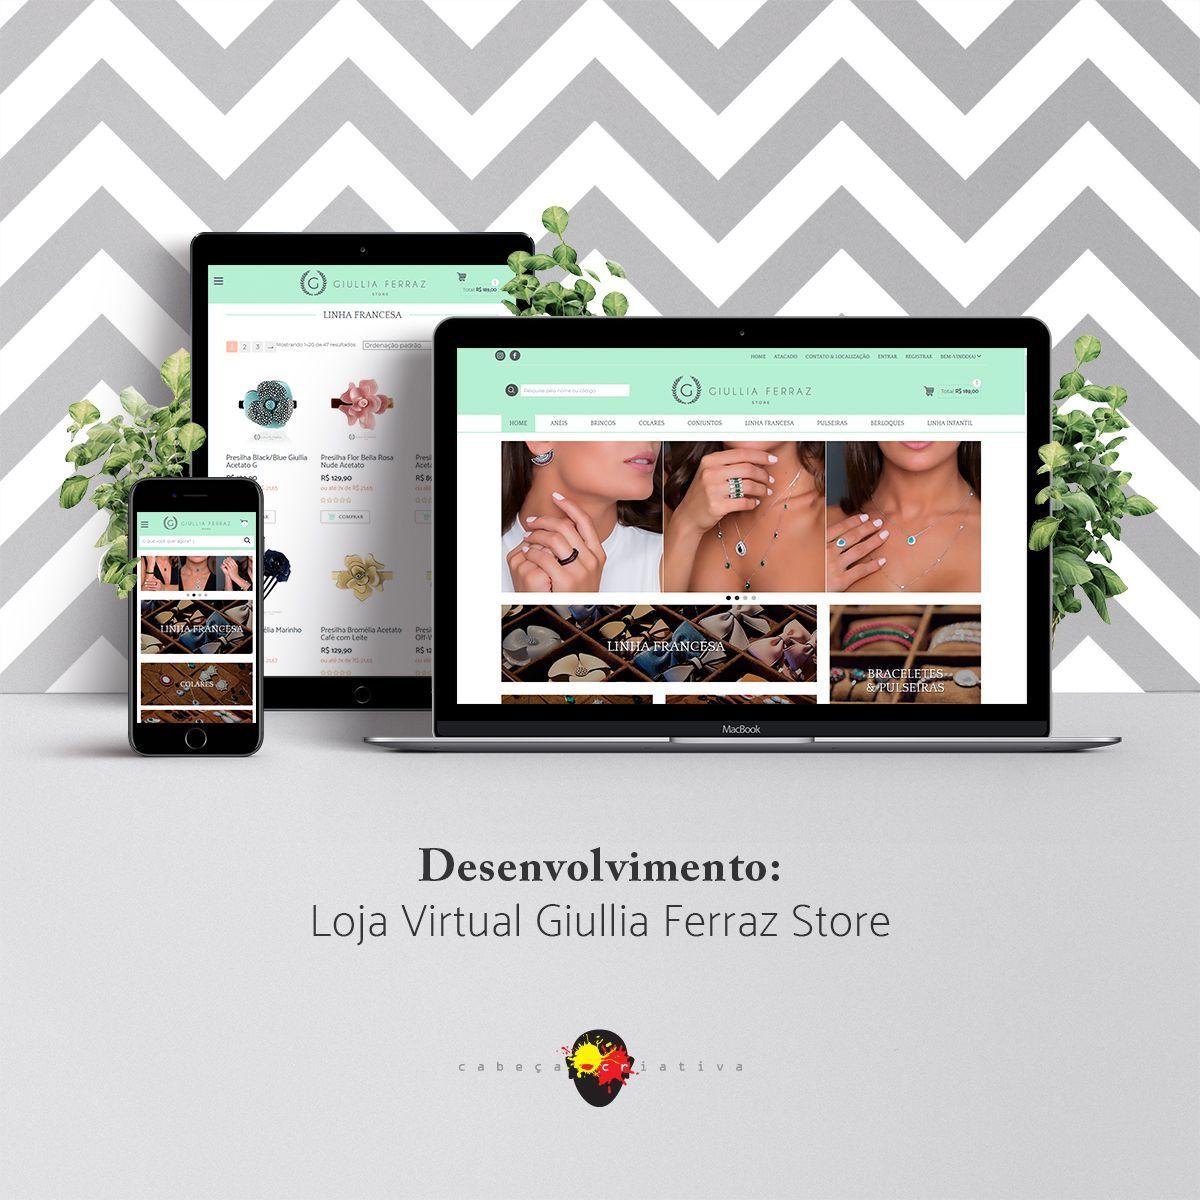 Loja Virtual Giullia Ferraz Store